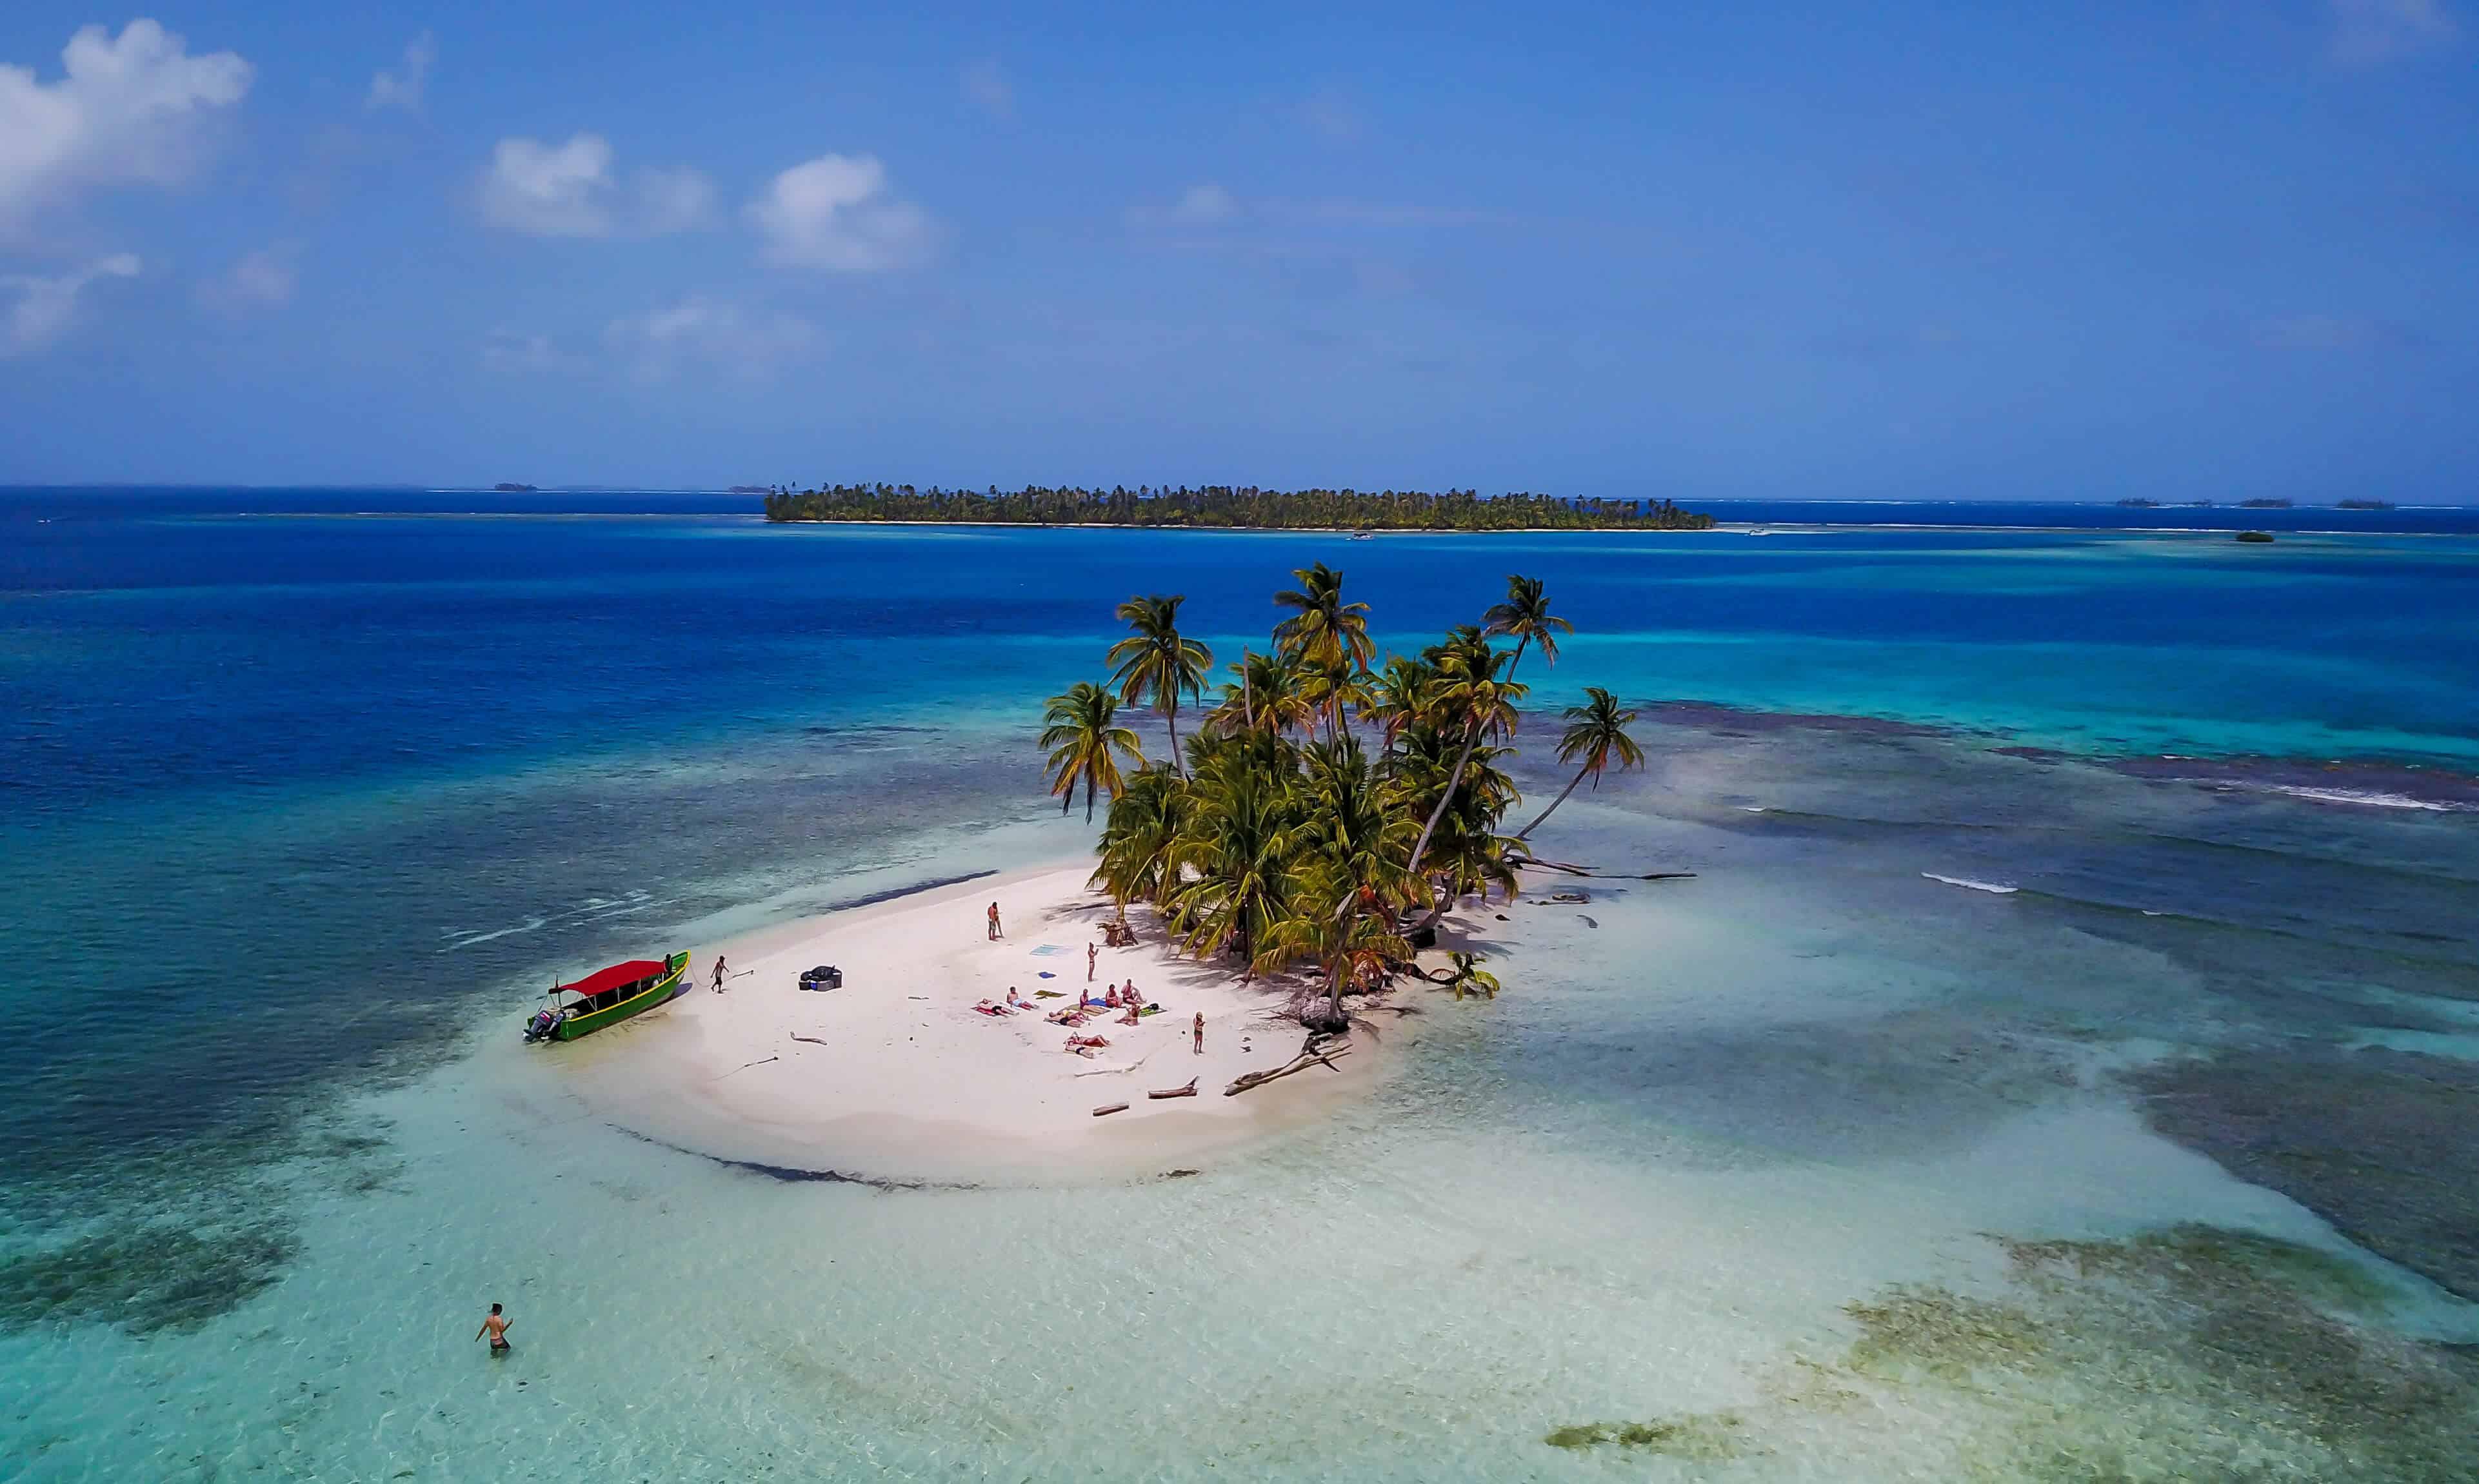 Visit the San Blas Islands to escape the cold